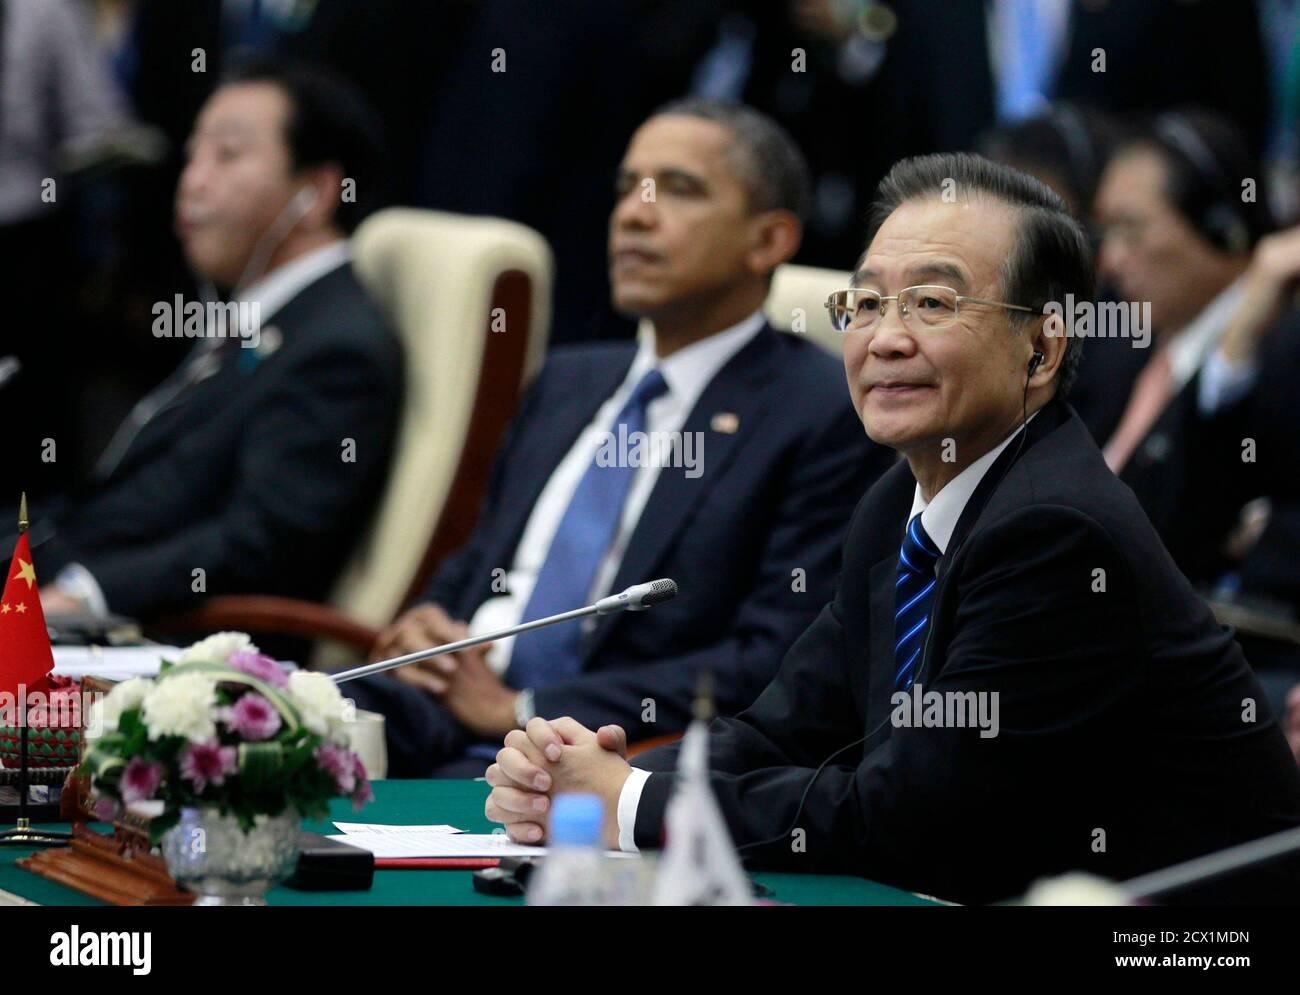 China's Premier Wen Jiabao (R) sits alongside U.S. President Barack Obama (2nd R) and Japan's Prime Minister Yoshihiko Noda during the East Asia Summit plenary session in Phnom Penh, November 20, 2012.   REUTERS/Jason Reed   (CAMBODIA - Tags: POLITICS) Foto de stock